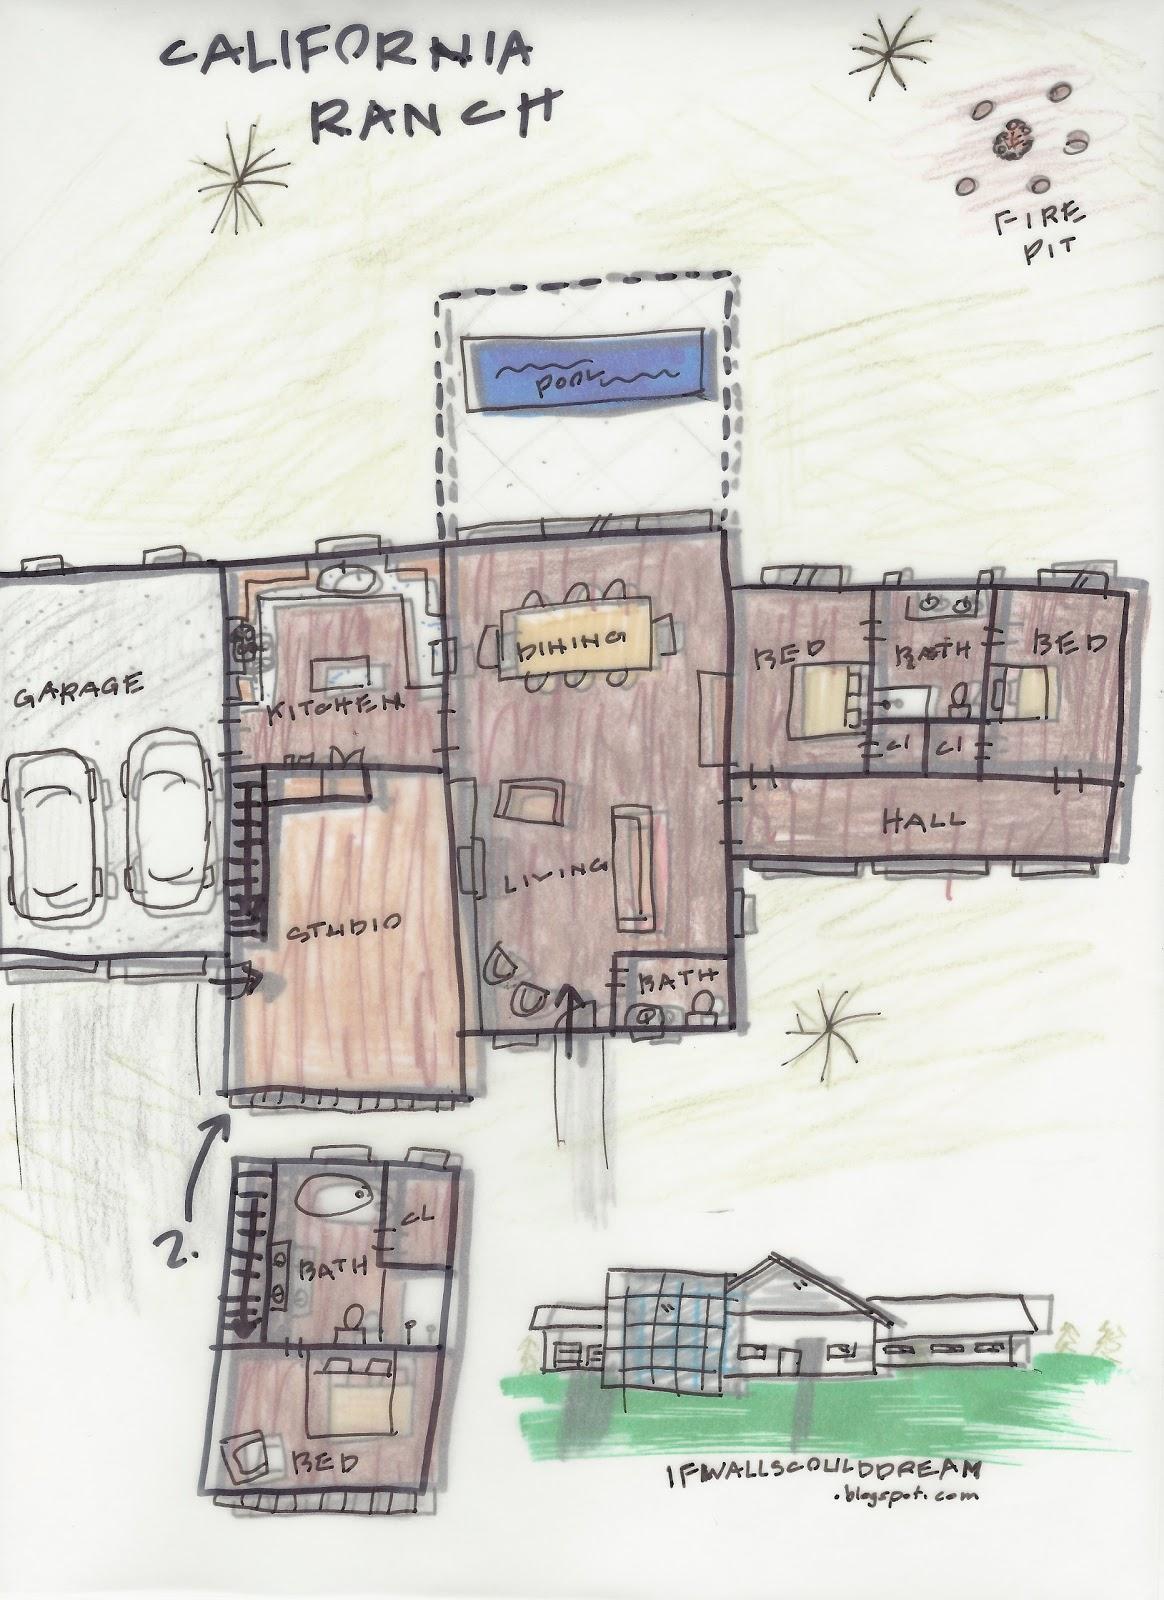 If Walls Could Dream...: California Ranch Floor Plan Sketch